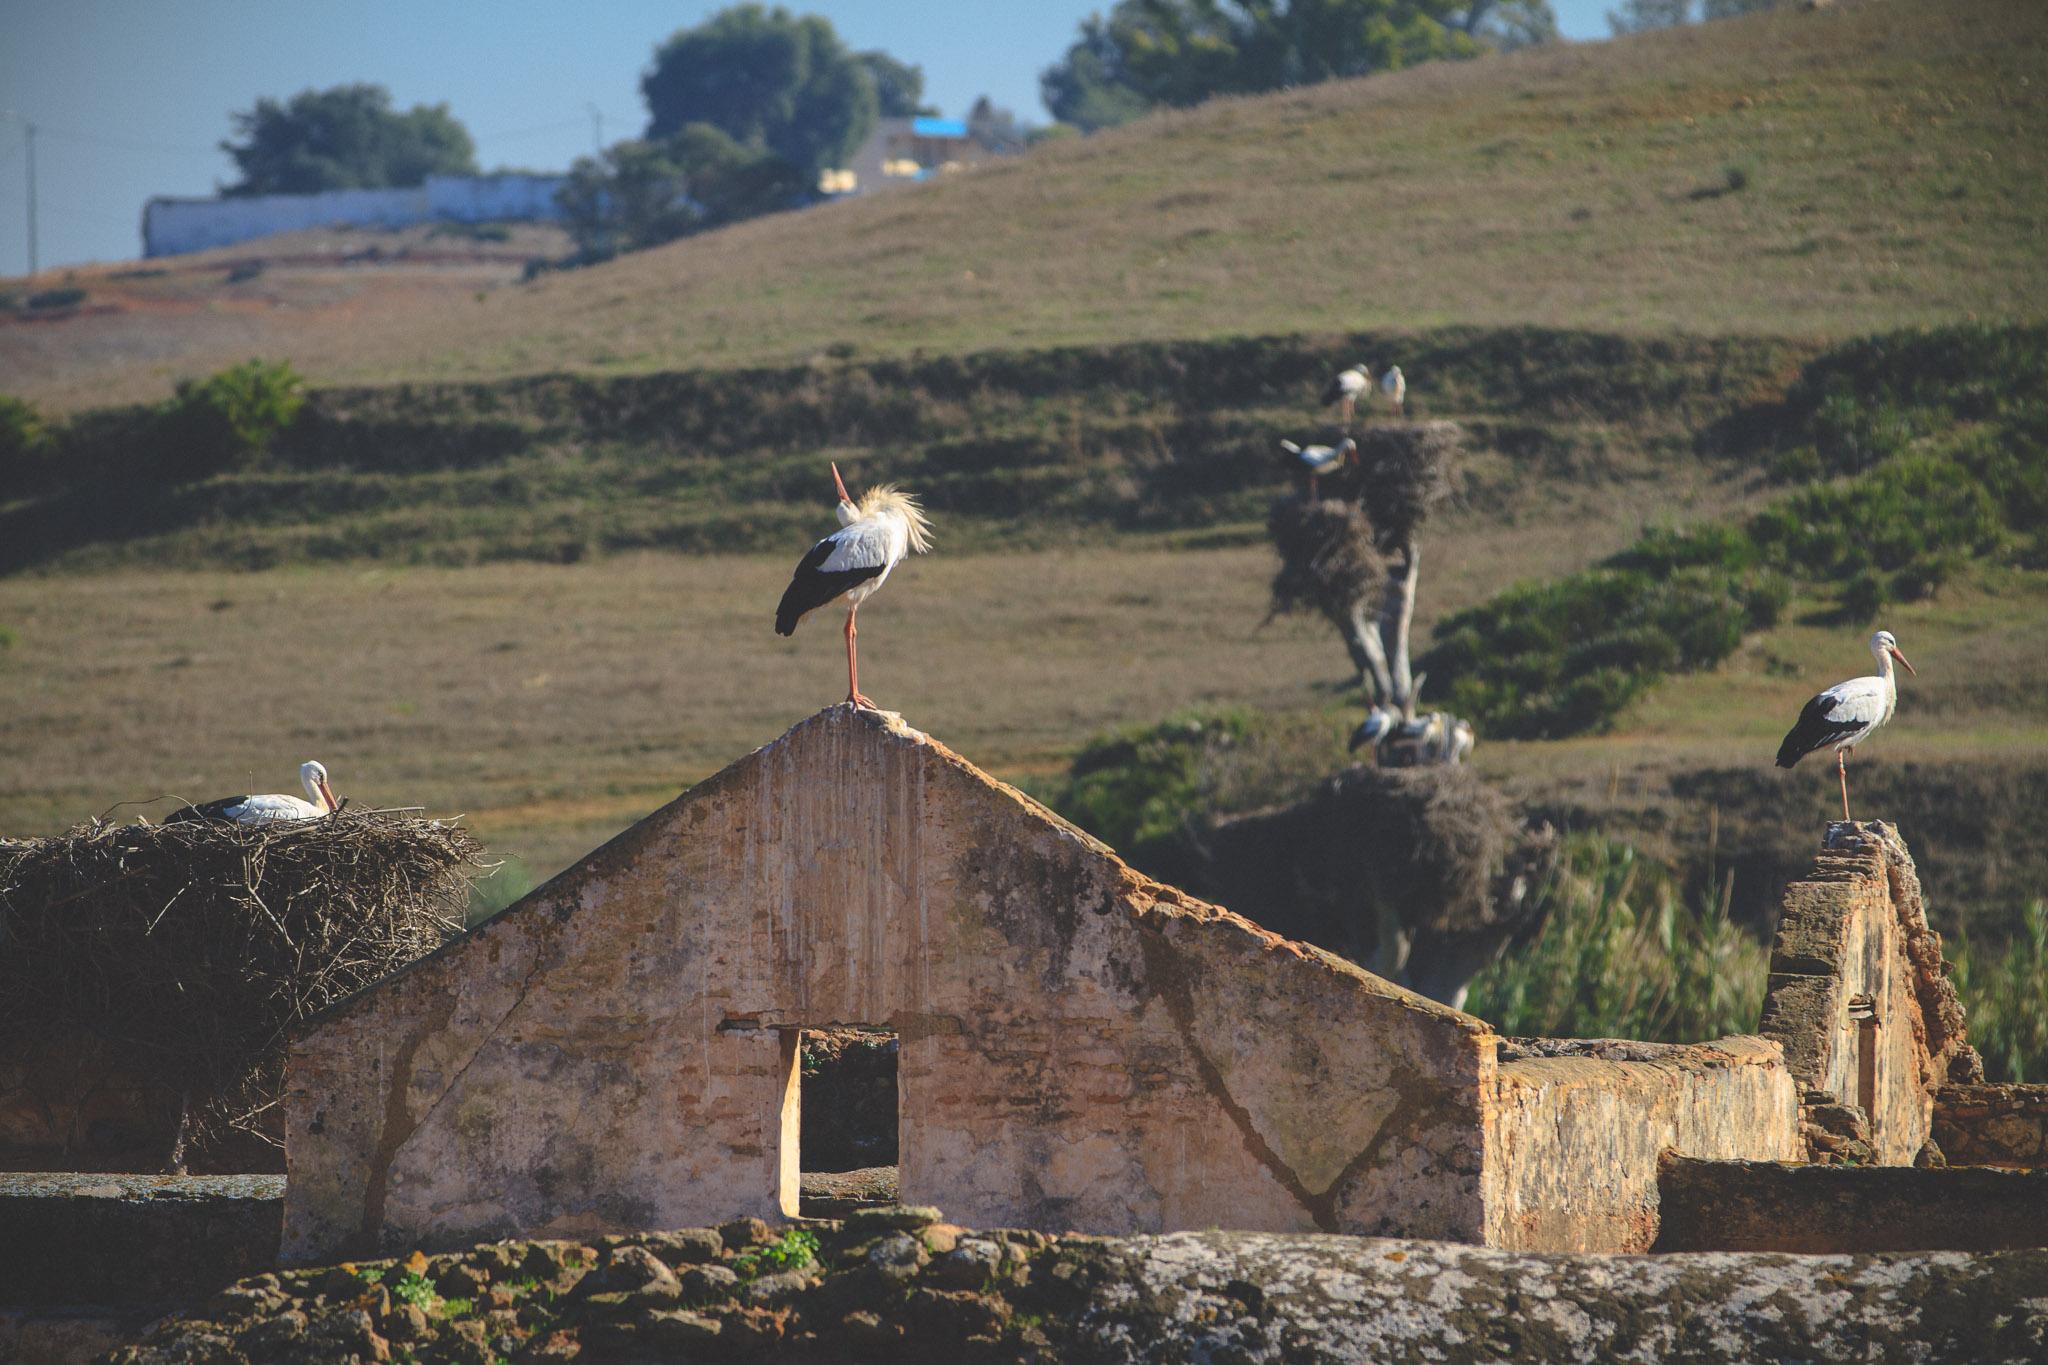 morocco_rabat_fez_casablanca_lesleyade_photography-23.jpg